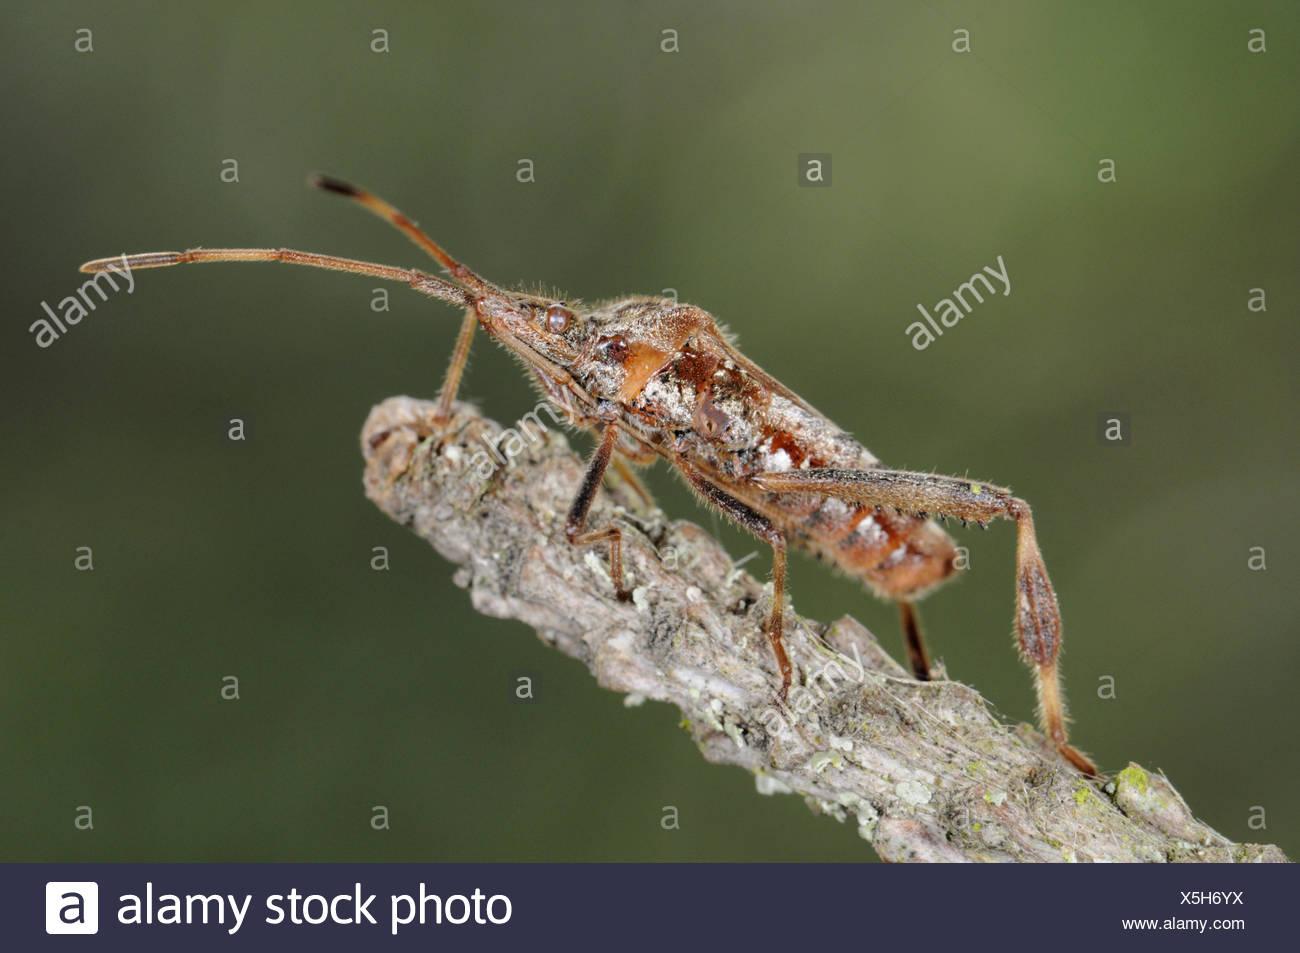 Western Conifer Seed Bug - Leptoglossus occidentalis - Stock Image